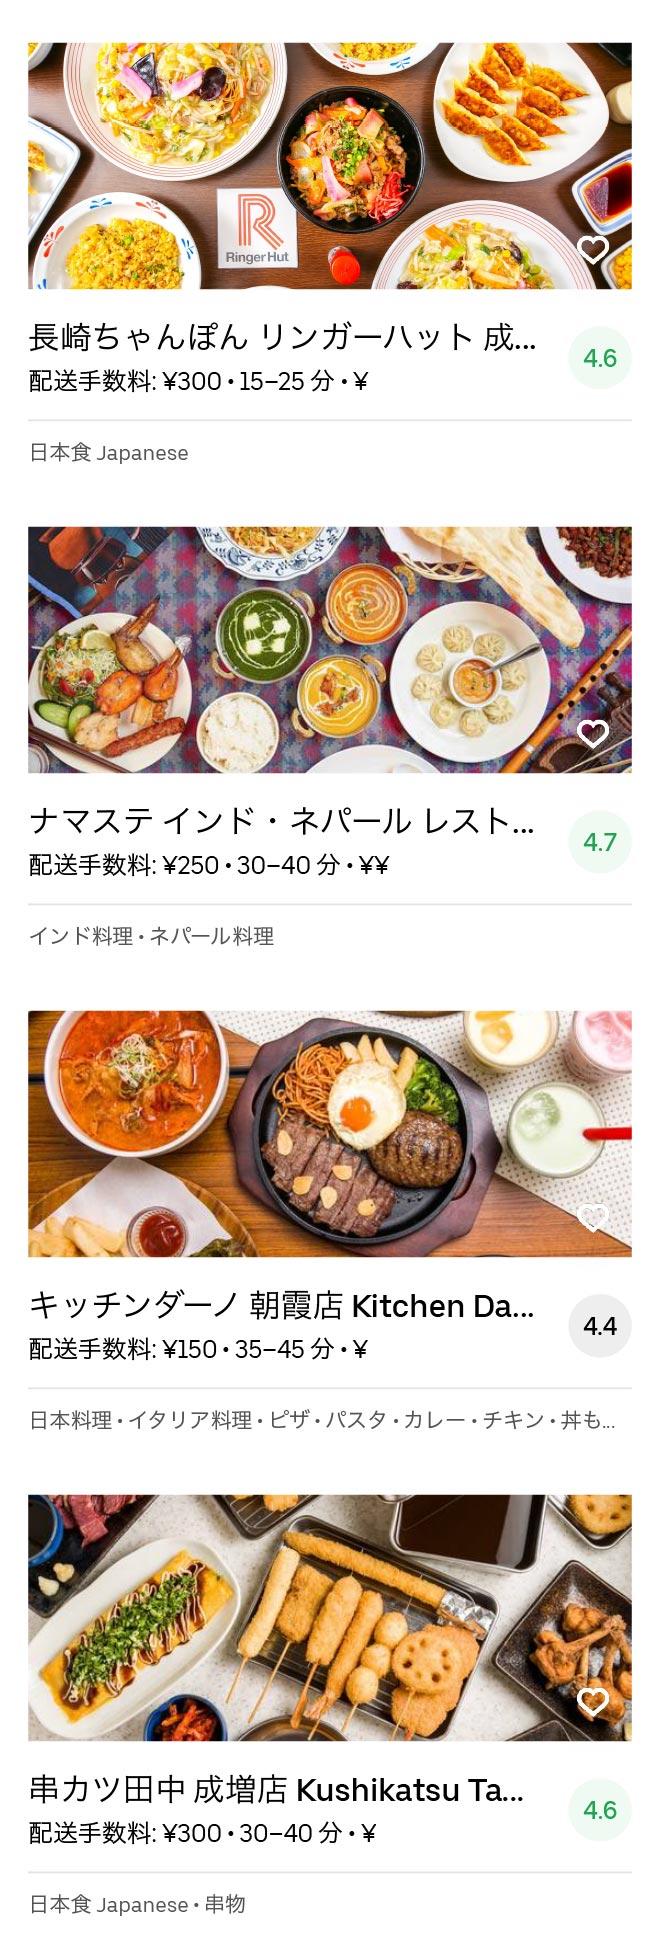 Saitama wako menu 2004 09